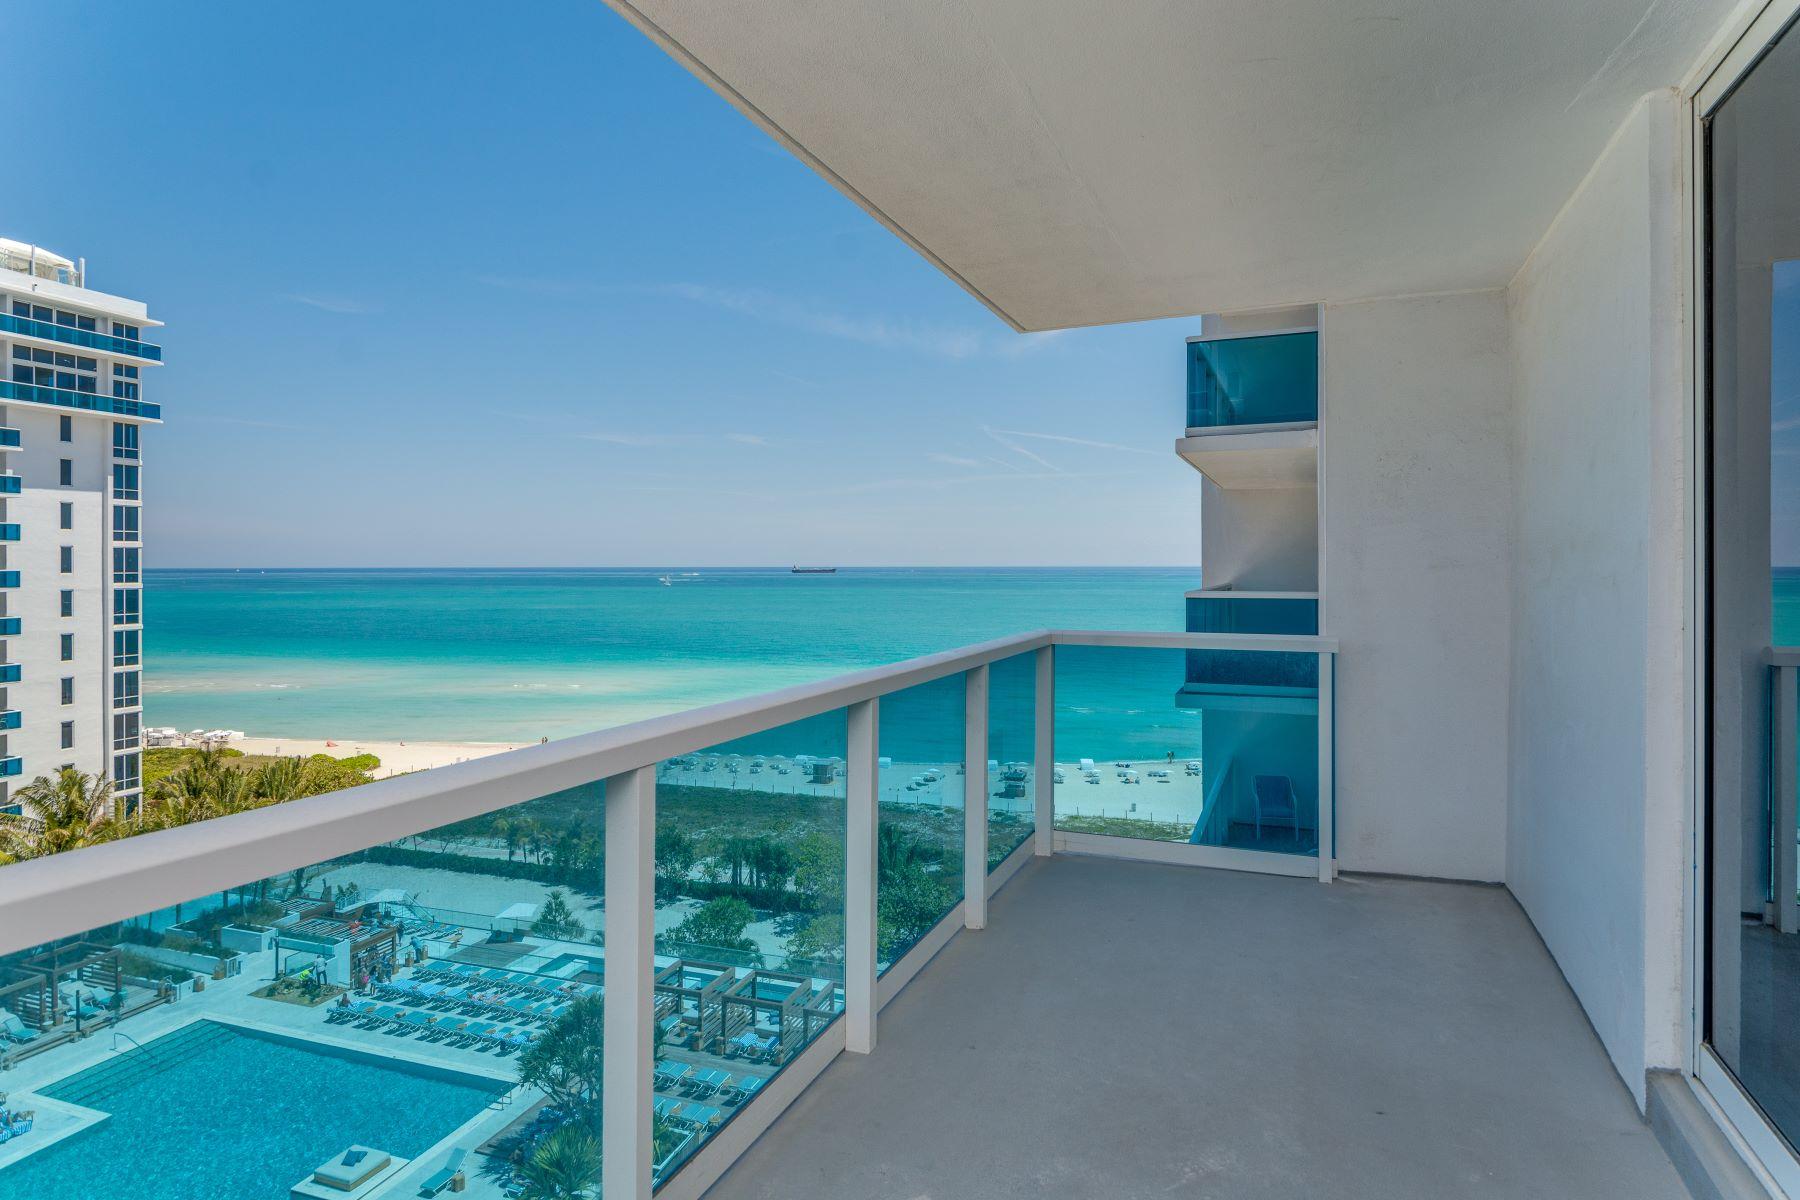 Condomínio para Venda às 2301 Collins Av #1116 2301 Collins Av 1116 Miami Beach, Florida, 33139 Estados Unidos